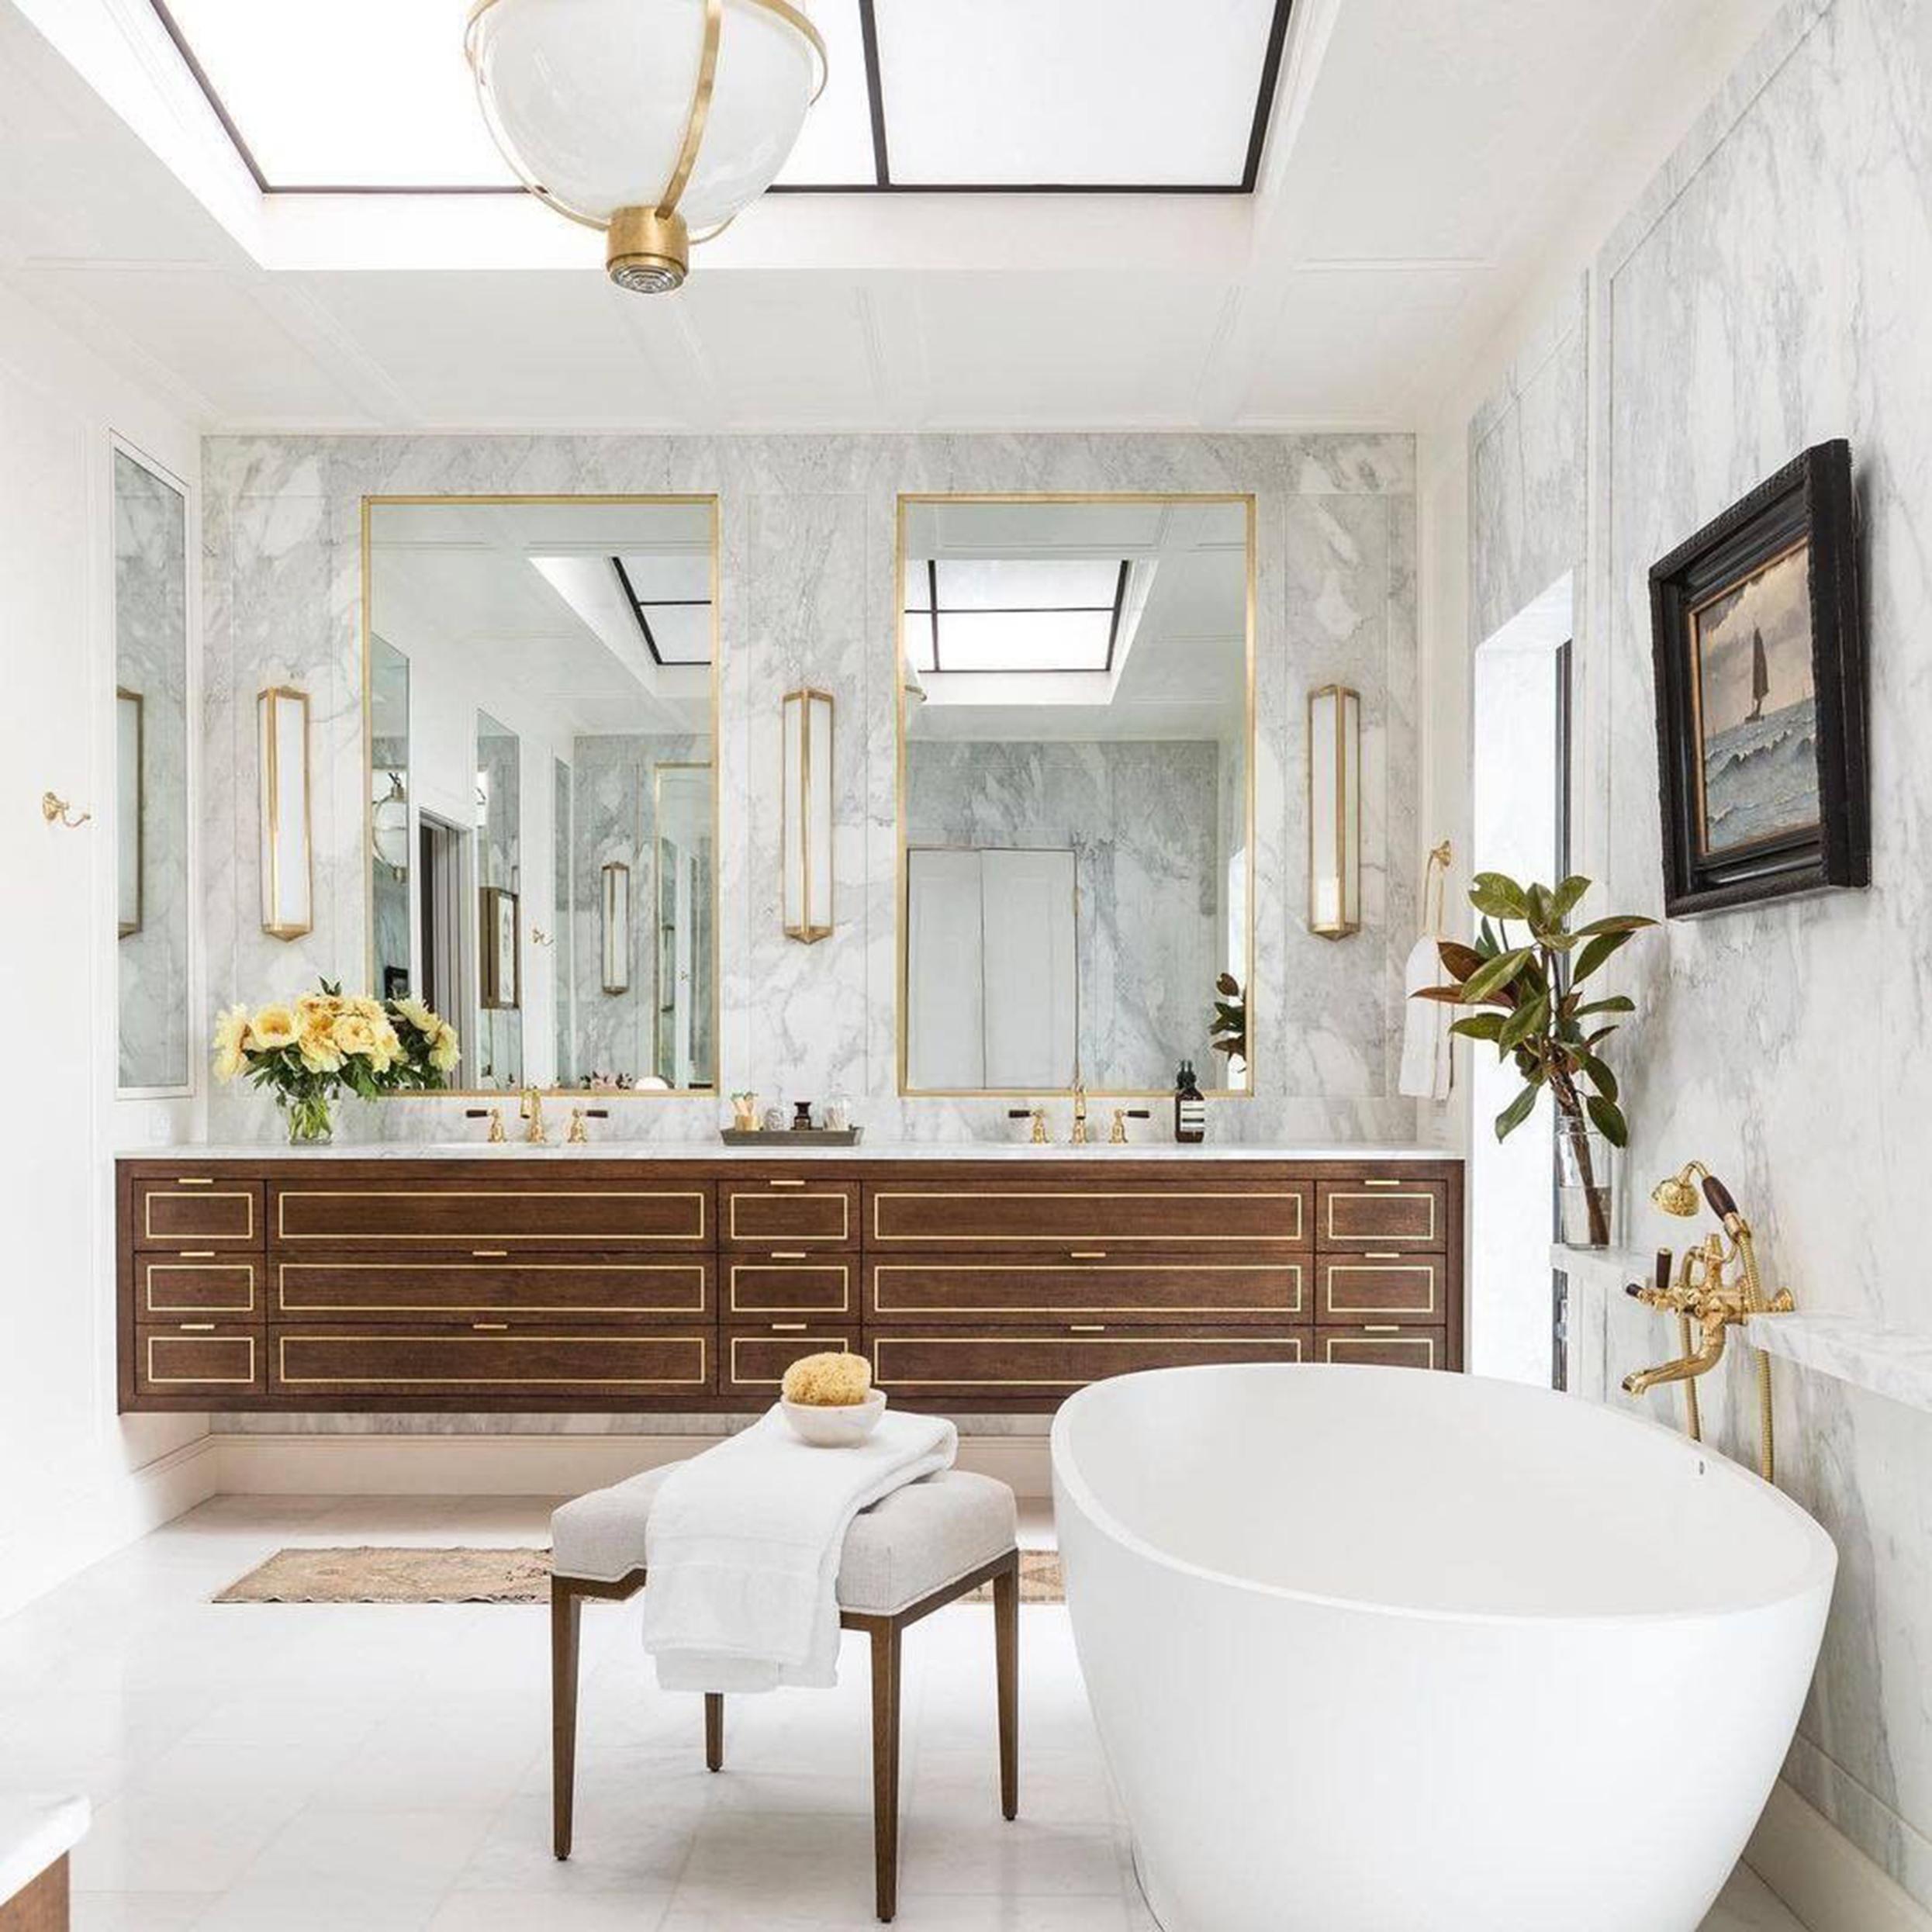 Double Sink Vanities double sink Double Sink Vanities 156279043 2950050495271001 5804648669293402667 n